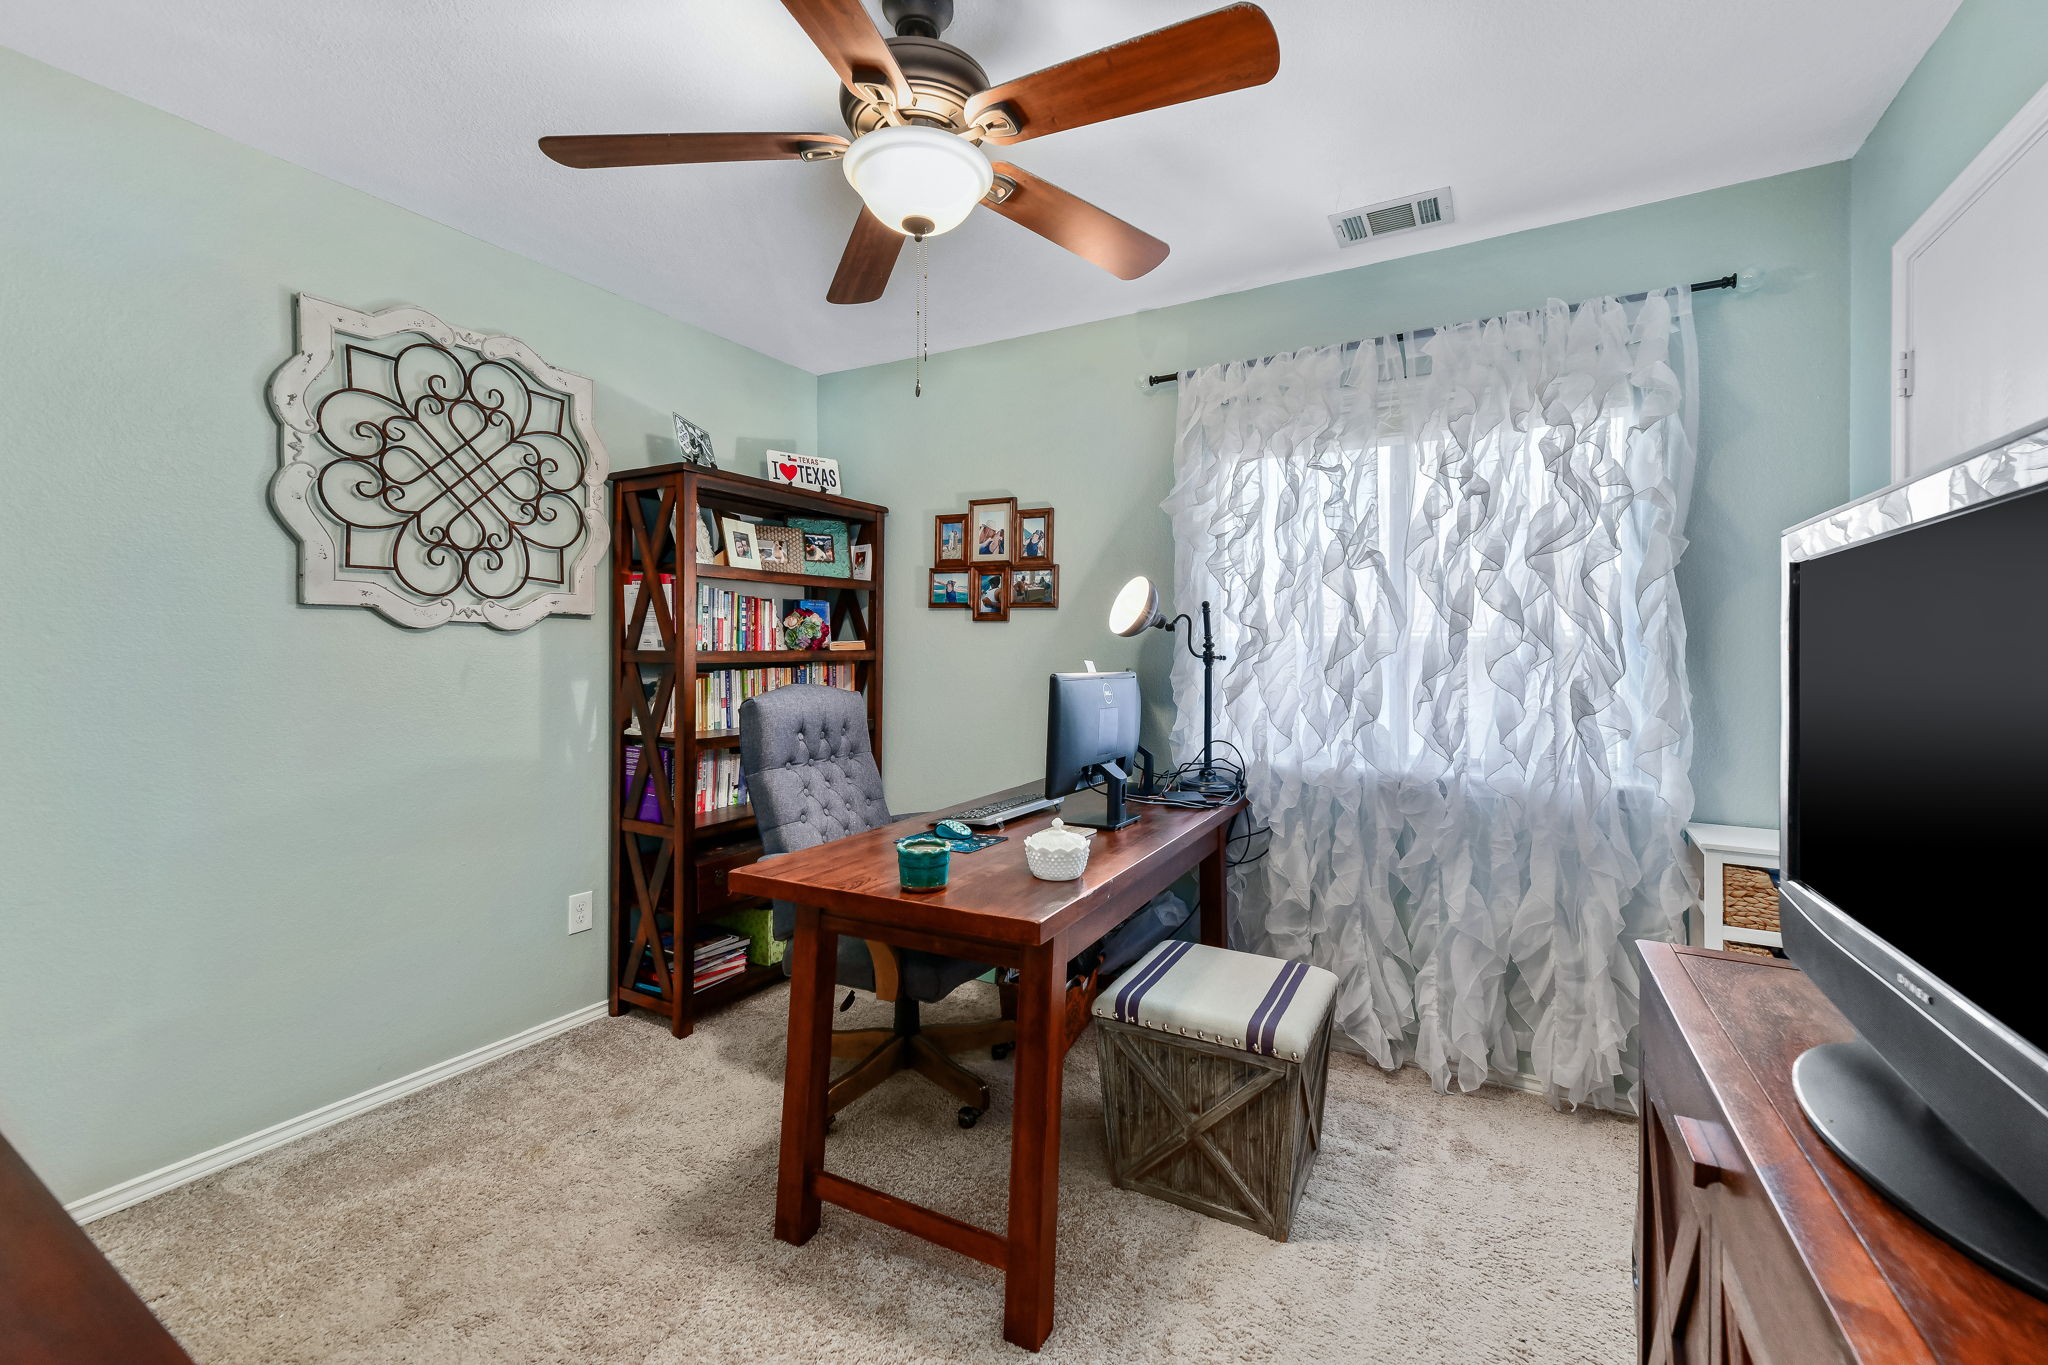 024-Bedroom 3-FULL